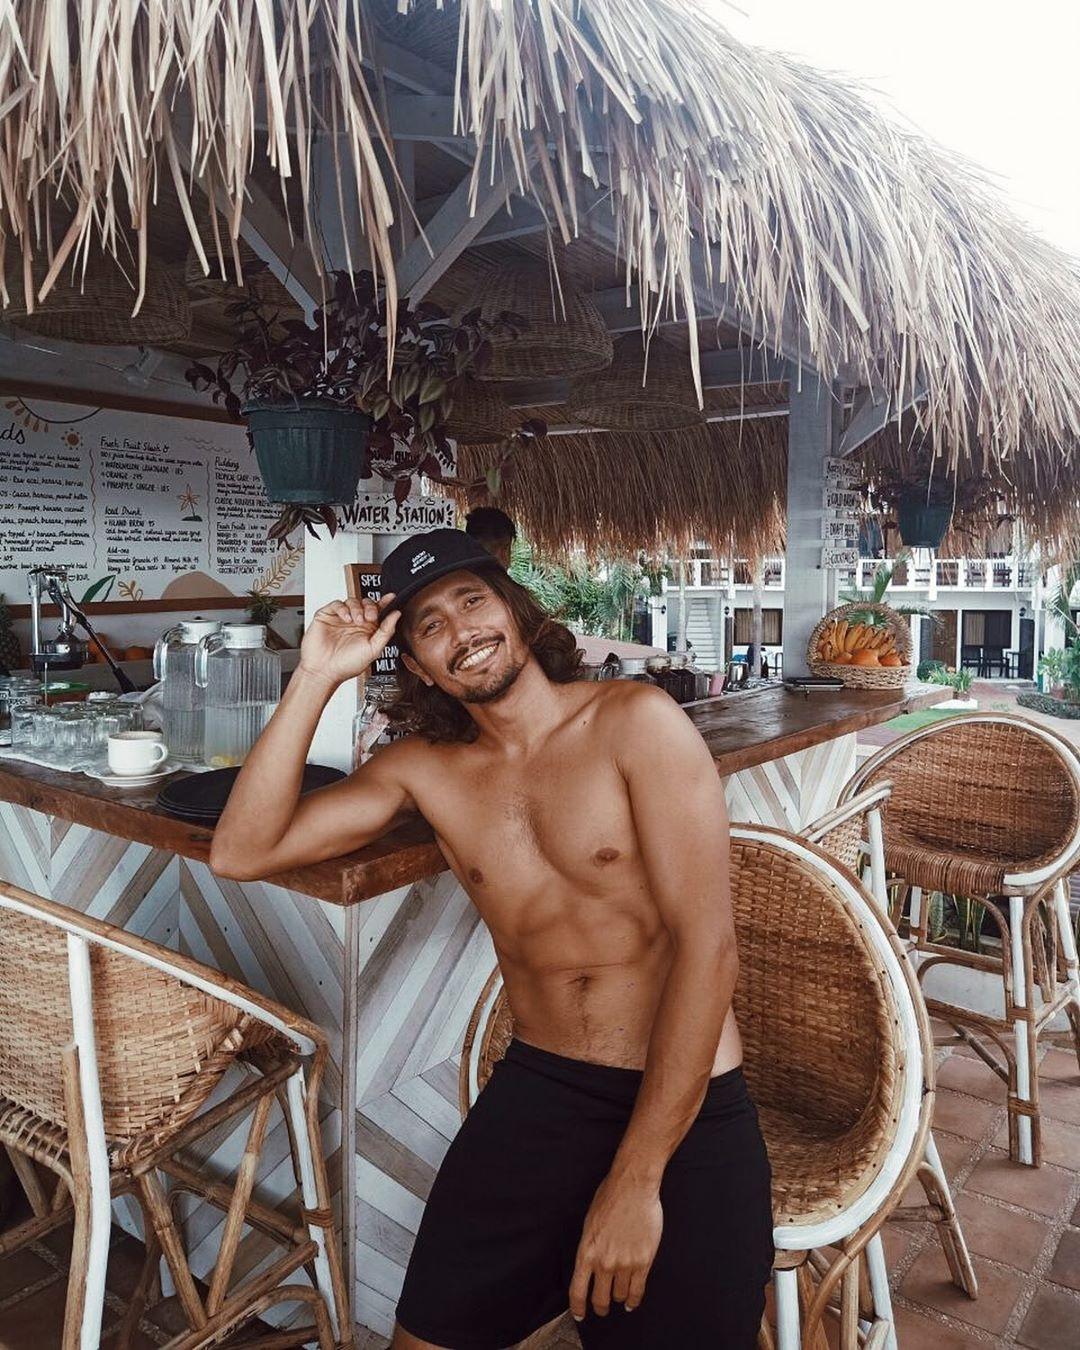 luke landrigan in his resort in la union